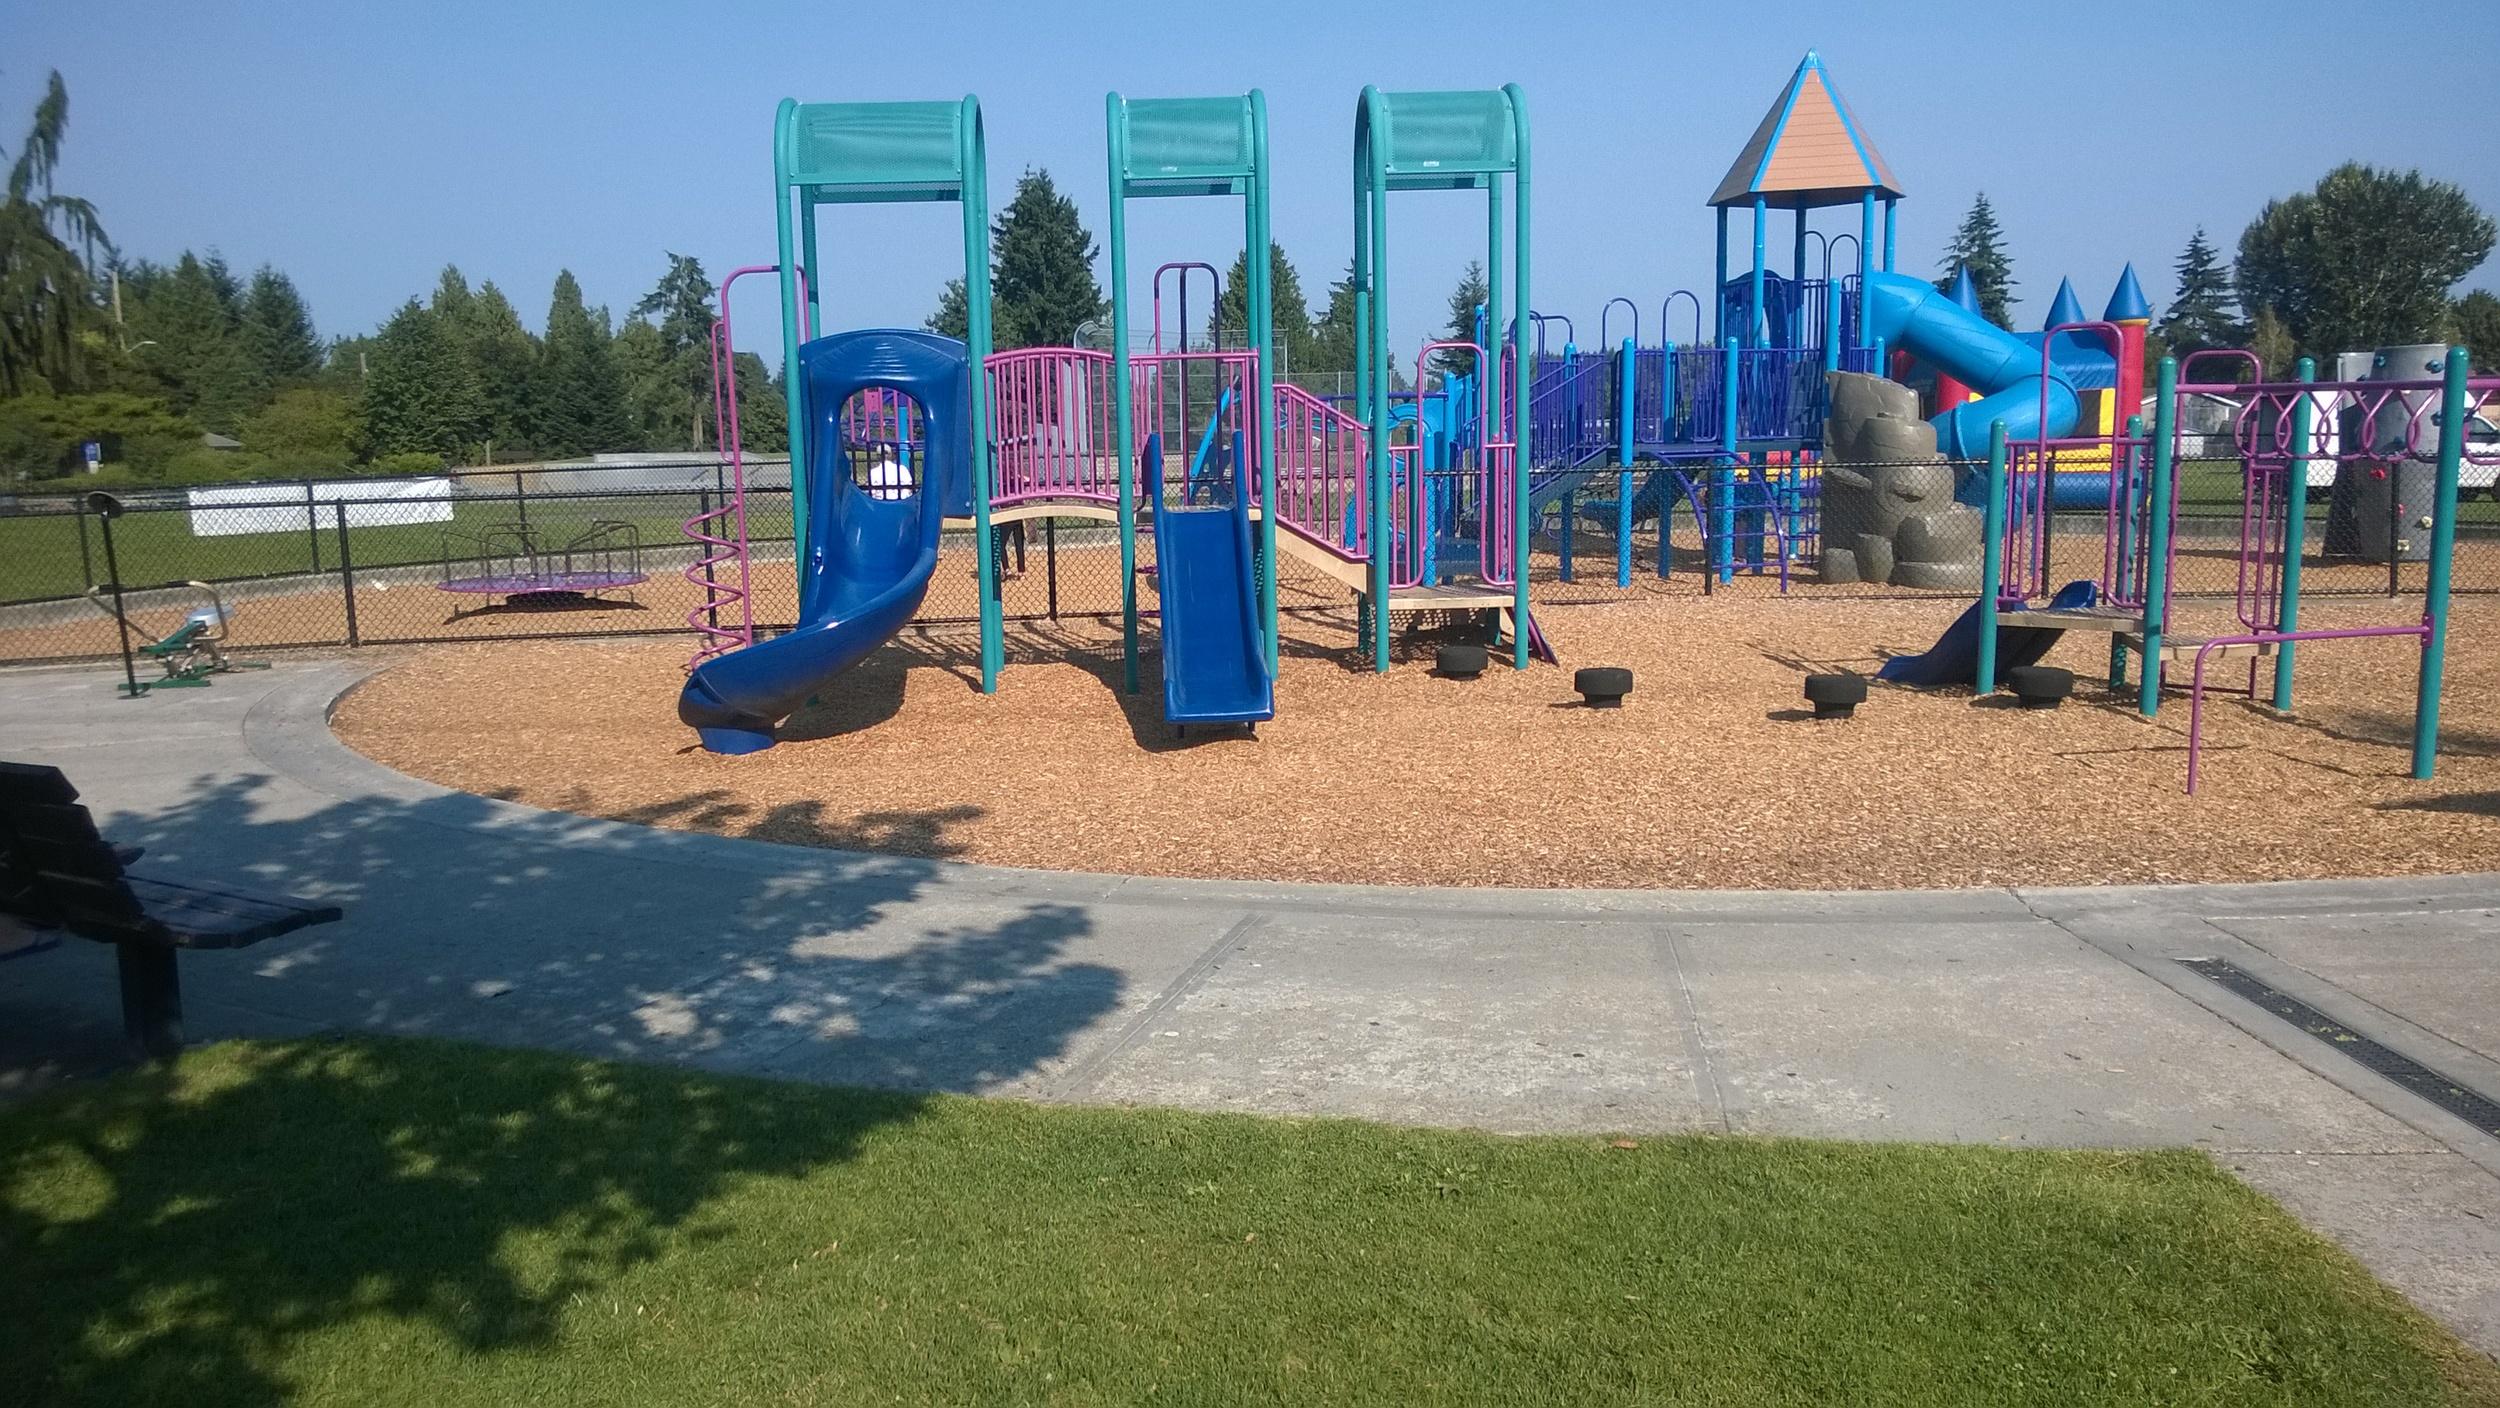 Nearby Paramount School Park